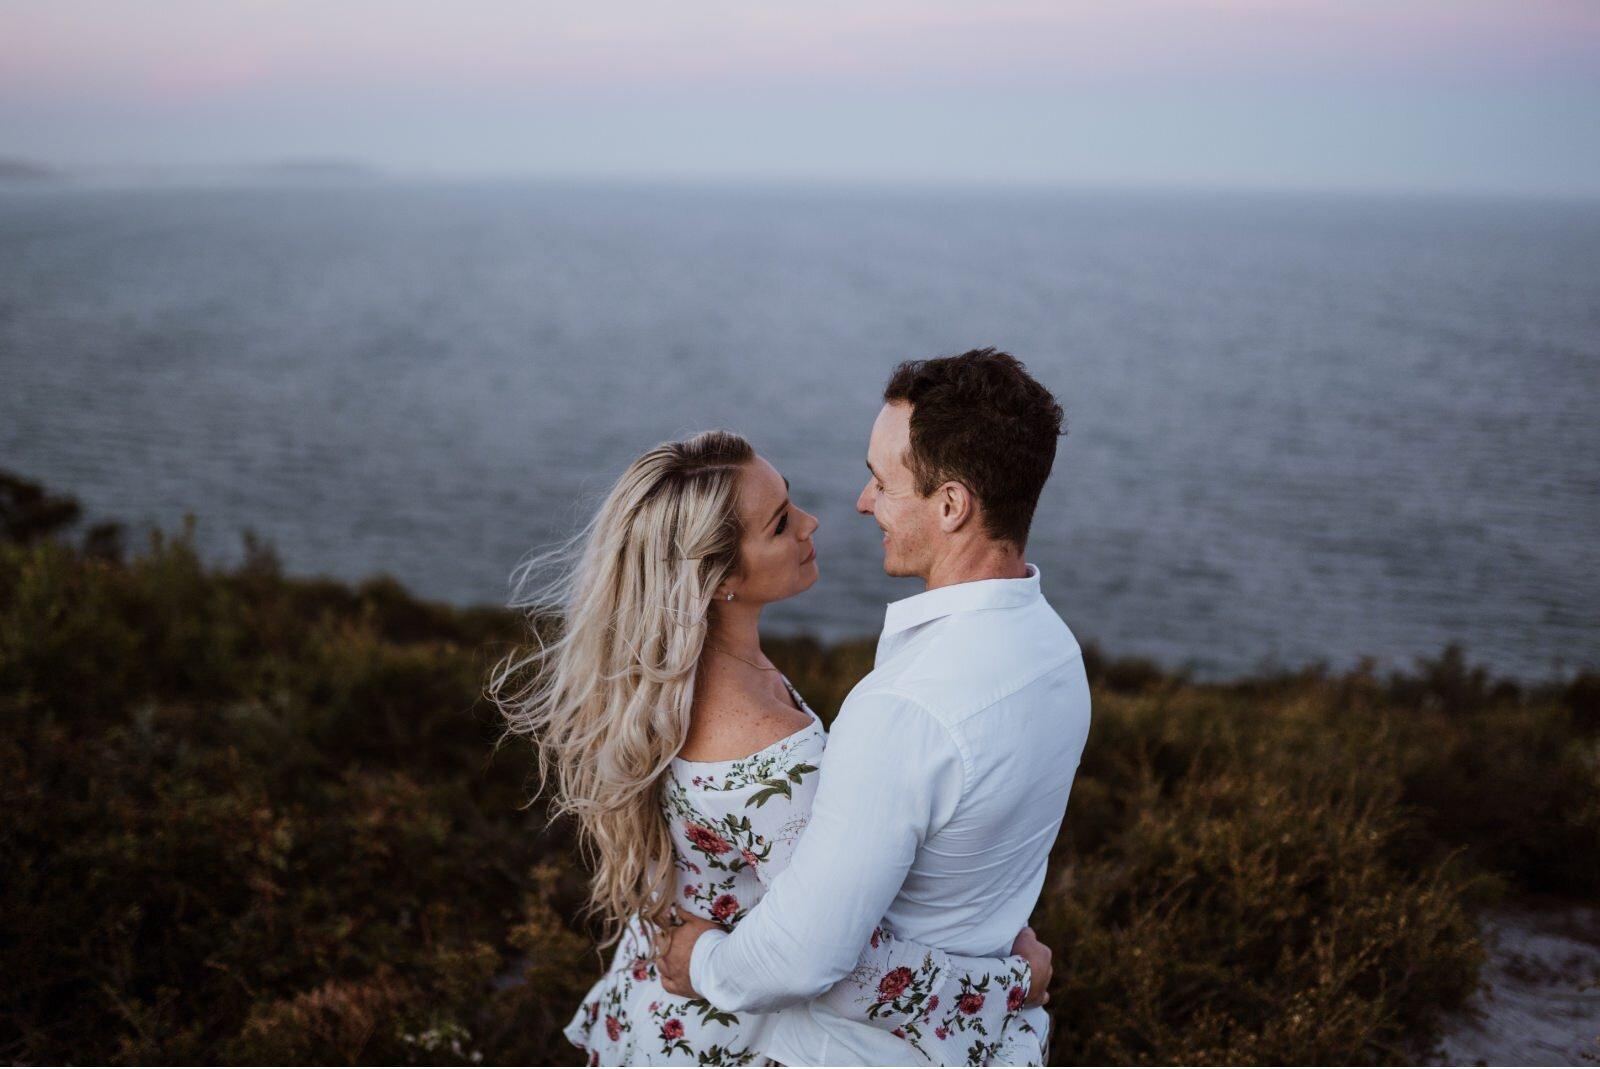 newcastle-wedding-photographer-dudley-engagement-shoot-26.jpg